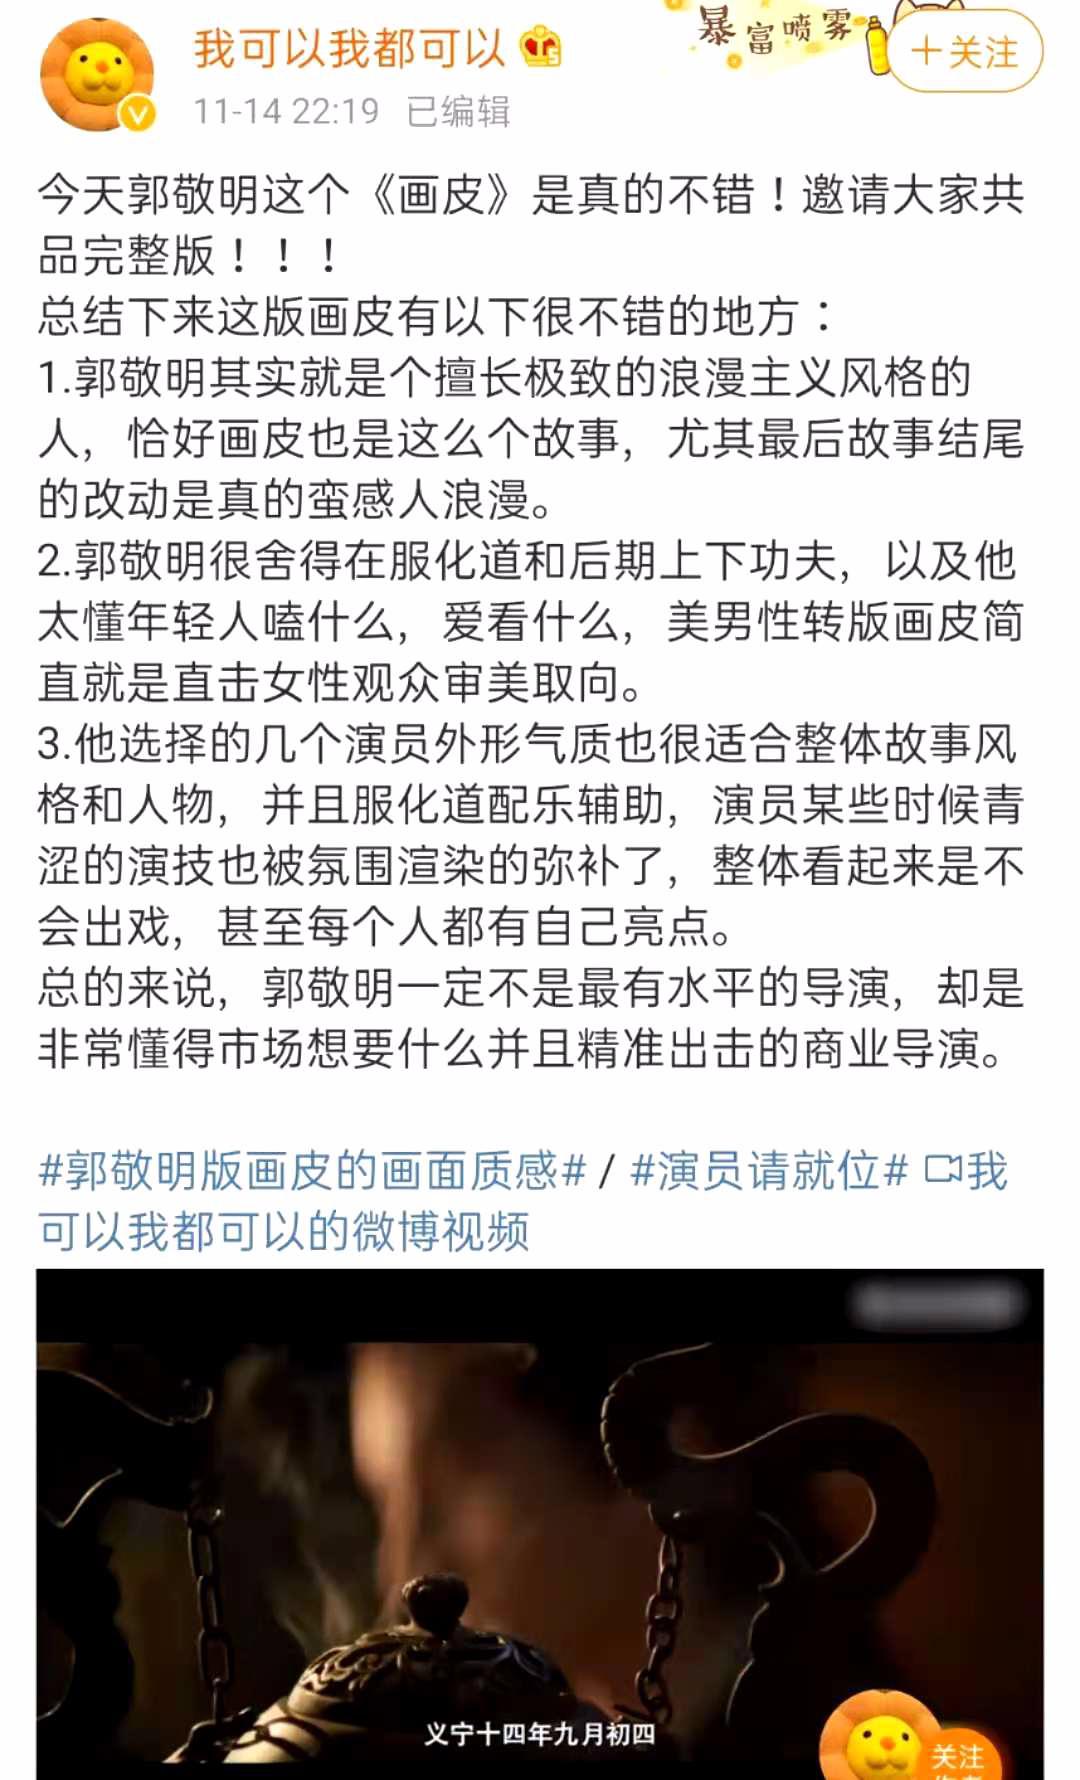 usdt支付平台(caibao.it):《晴雅集》《侍神令》题材撞车,谁是最强阴阳师 第28张